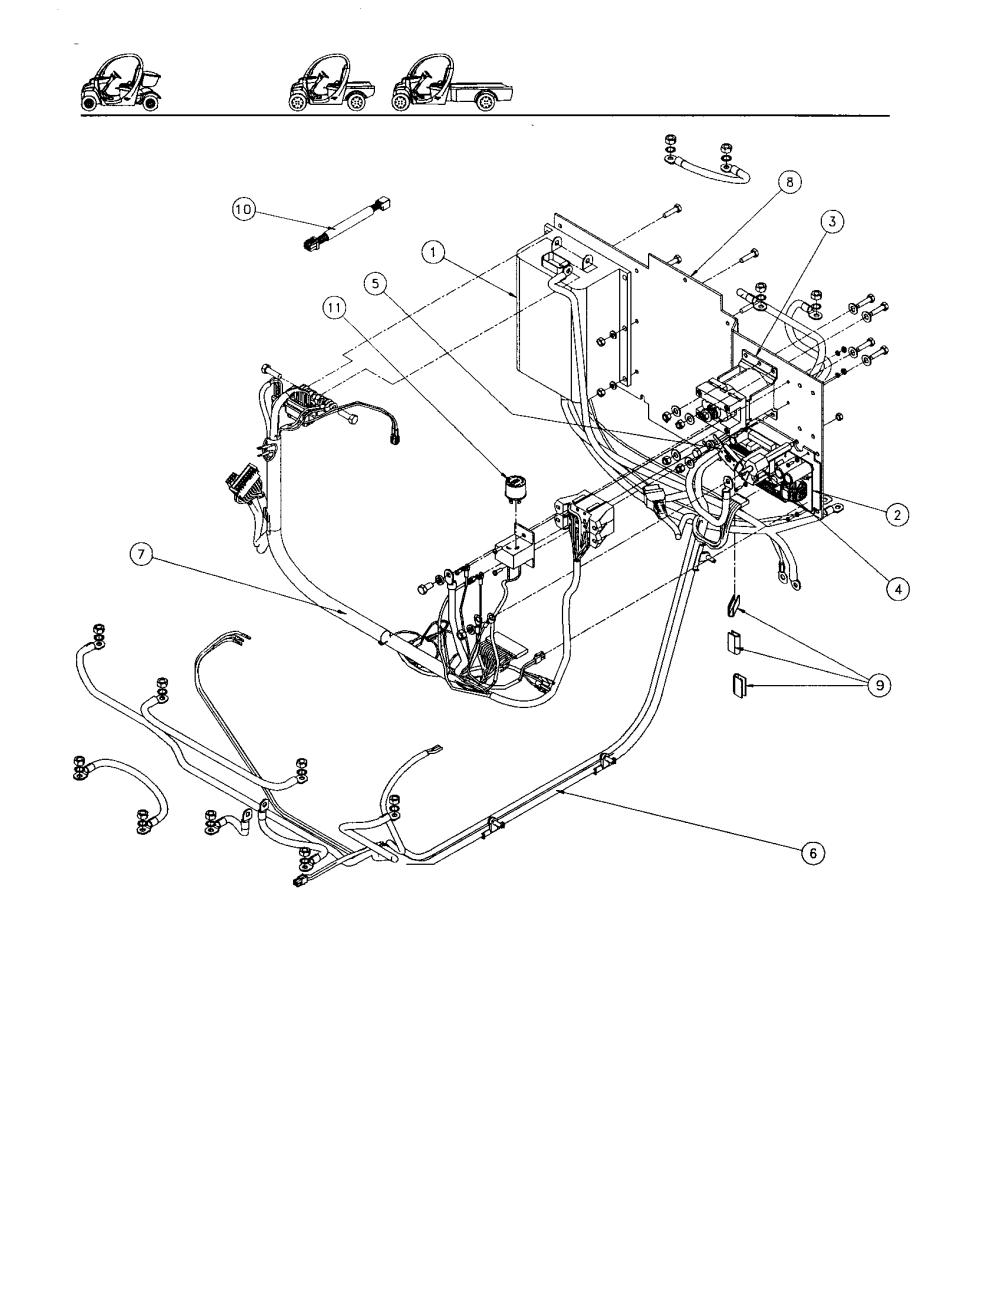 medium resolution of gem car e825 wiring diagram wiring diagram inside